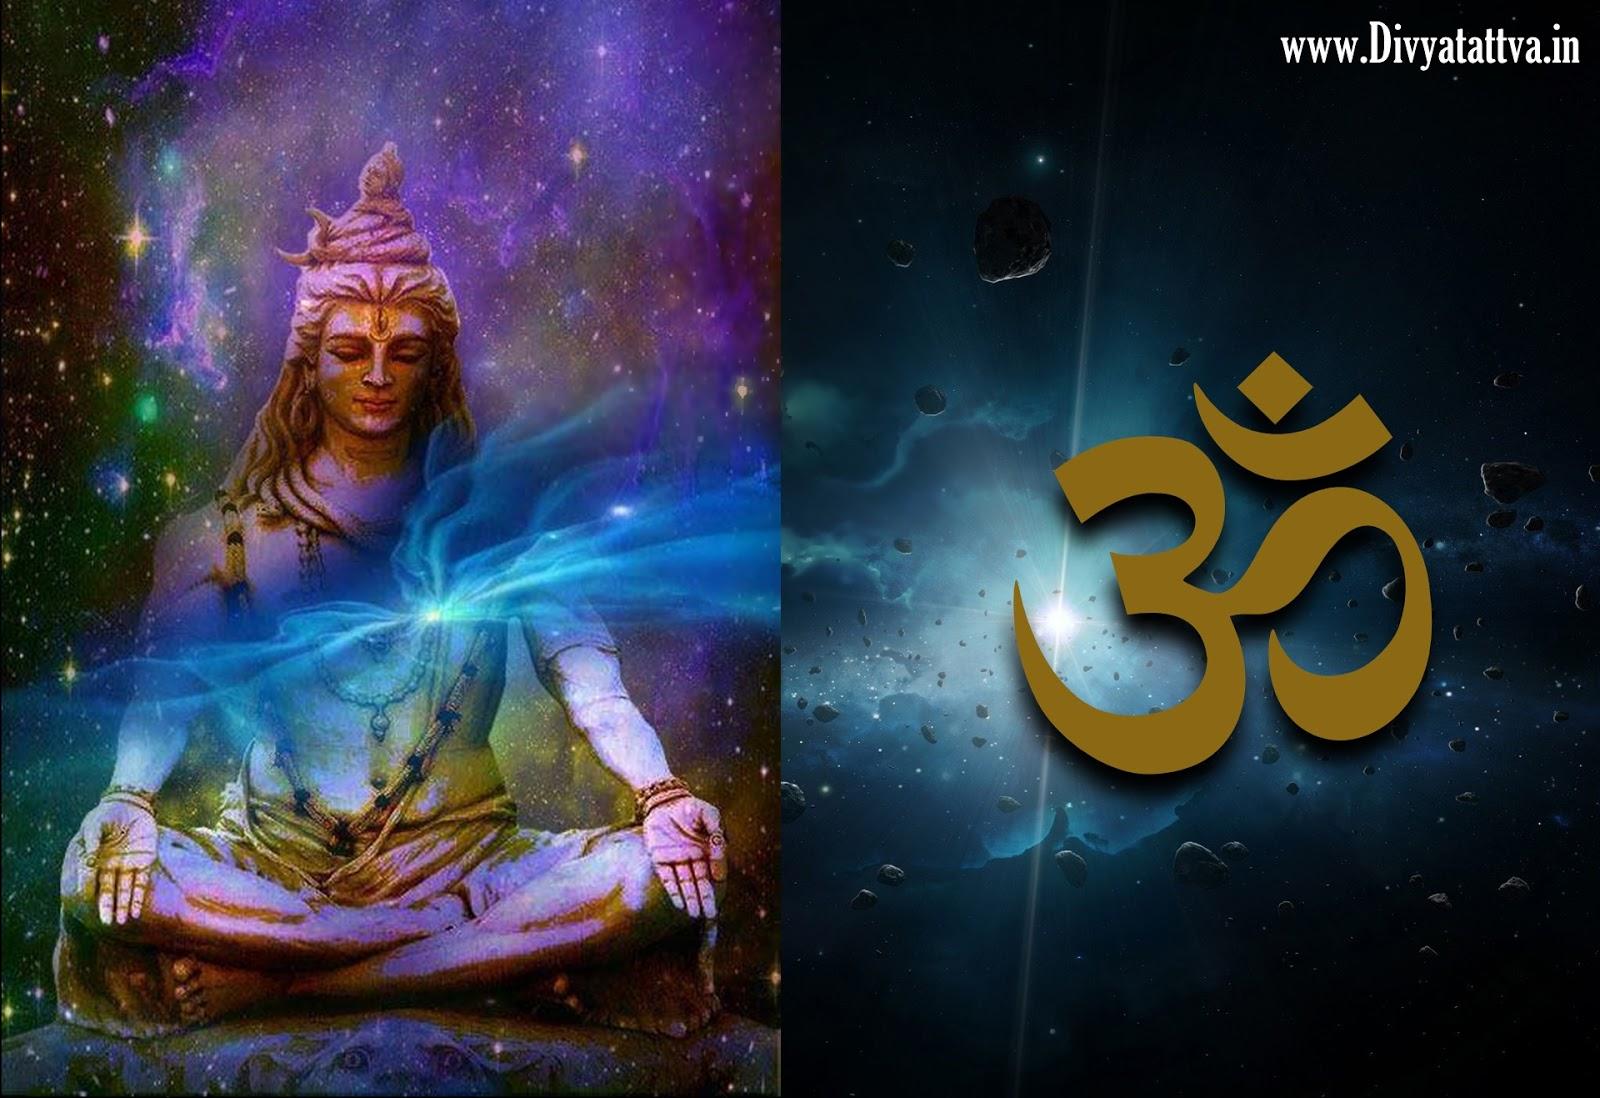 Hindu God Lord Shiva Images Shiv Wallpapers Trinetra Photos Pics Download